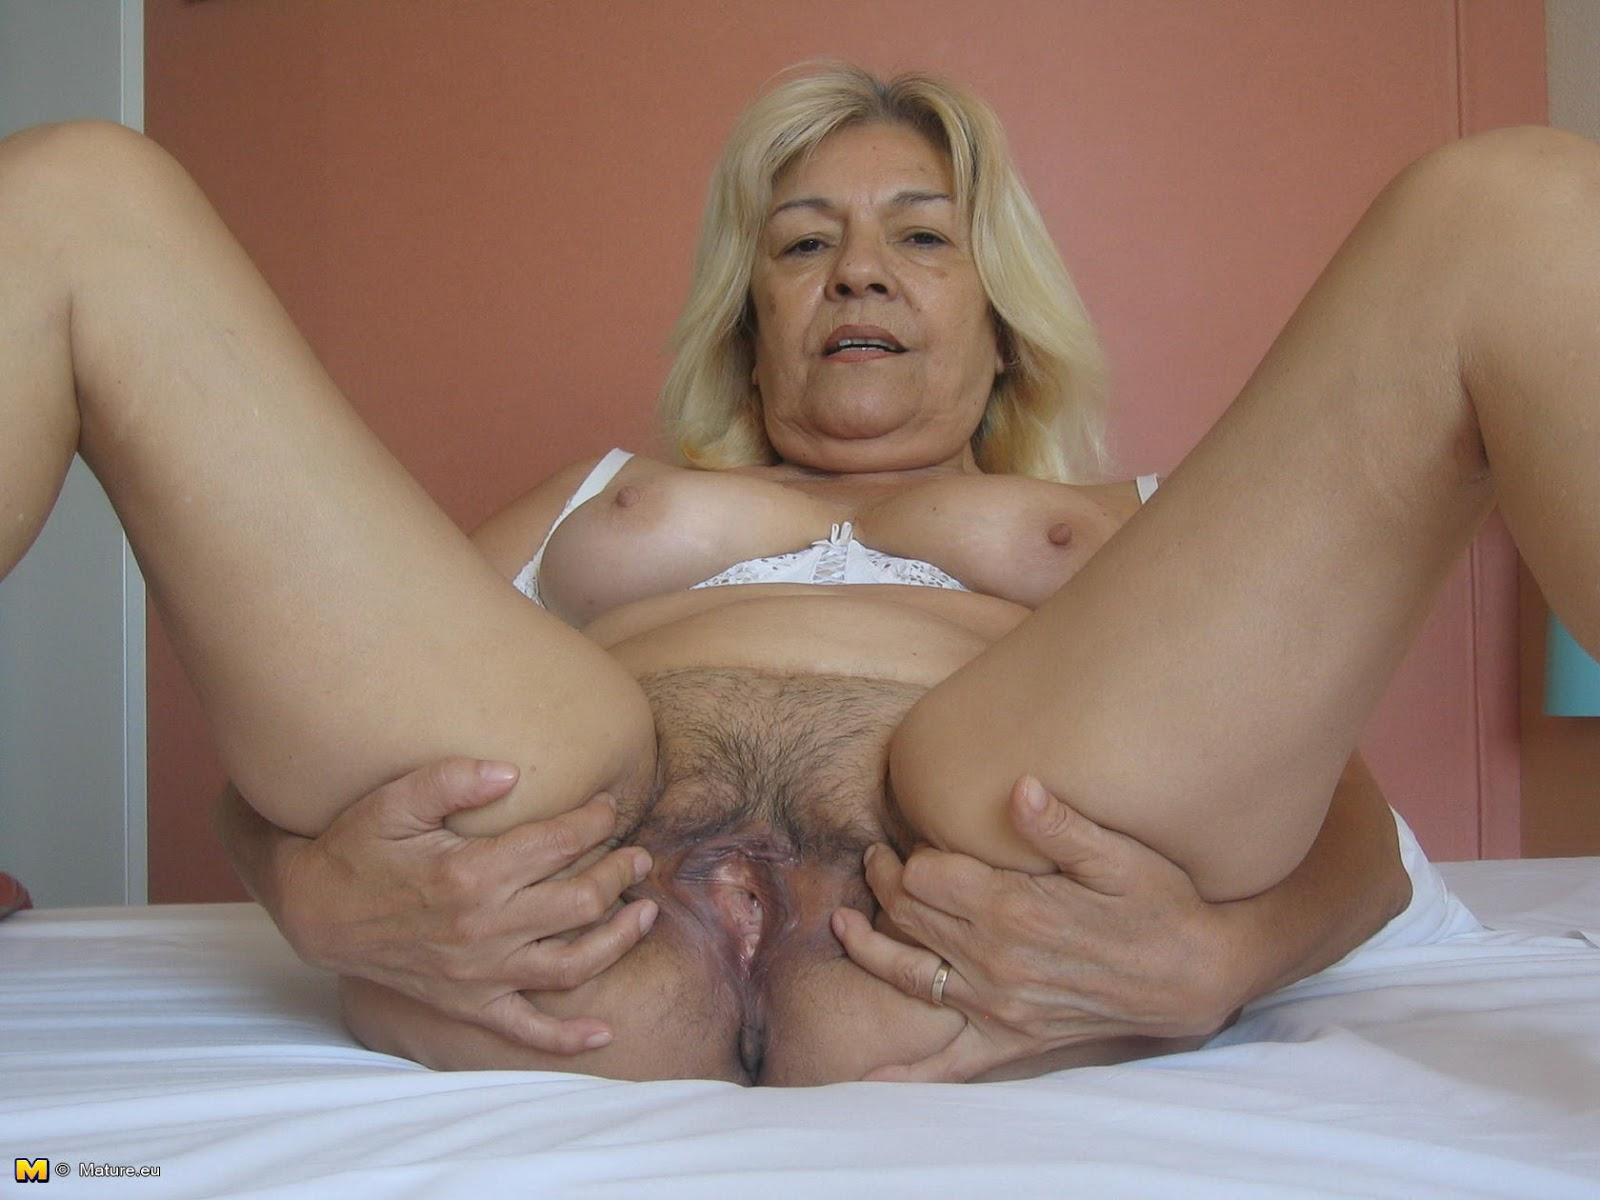 Year old women 70 fat